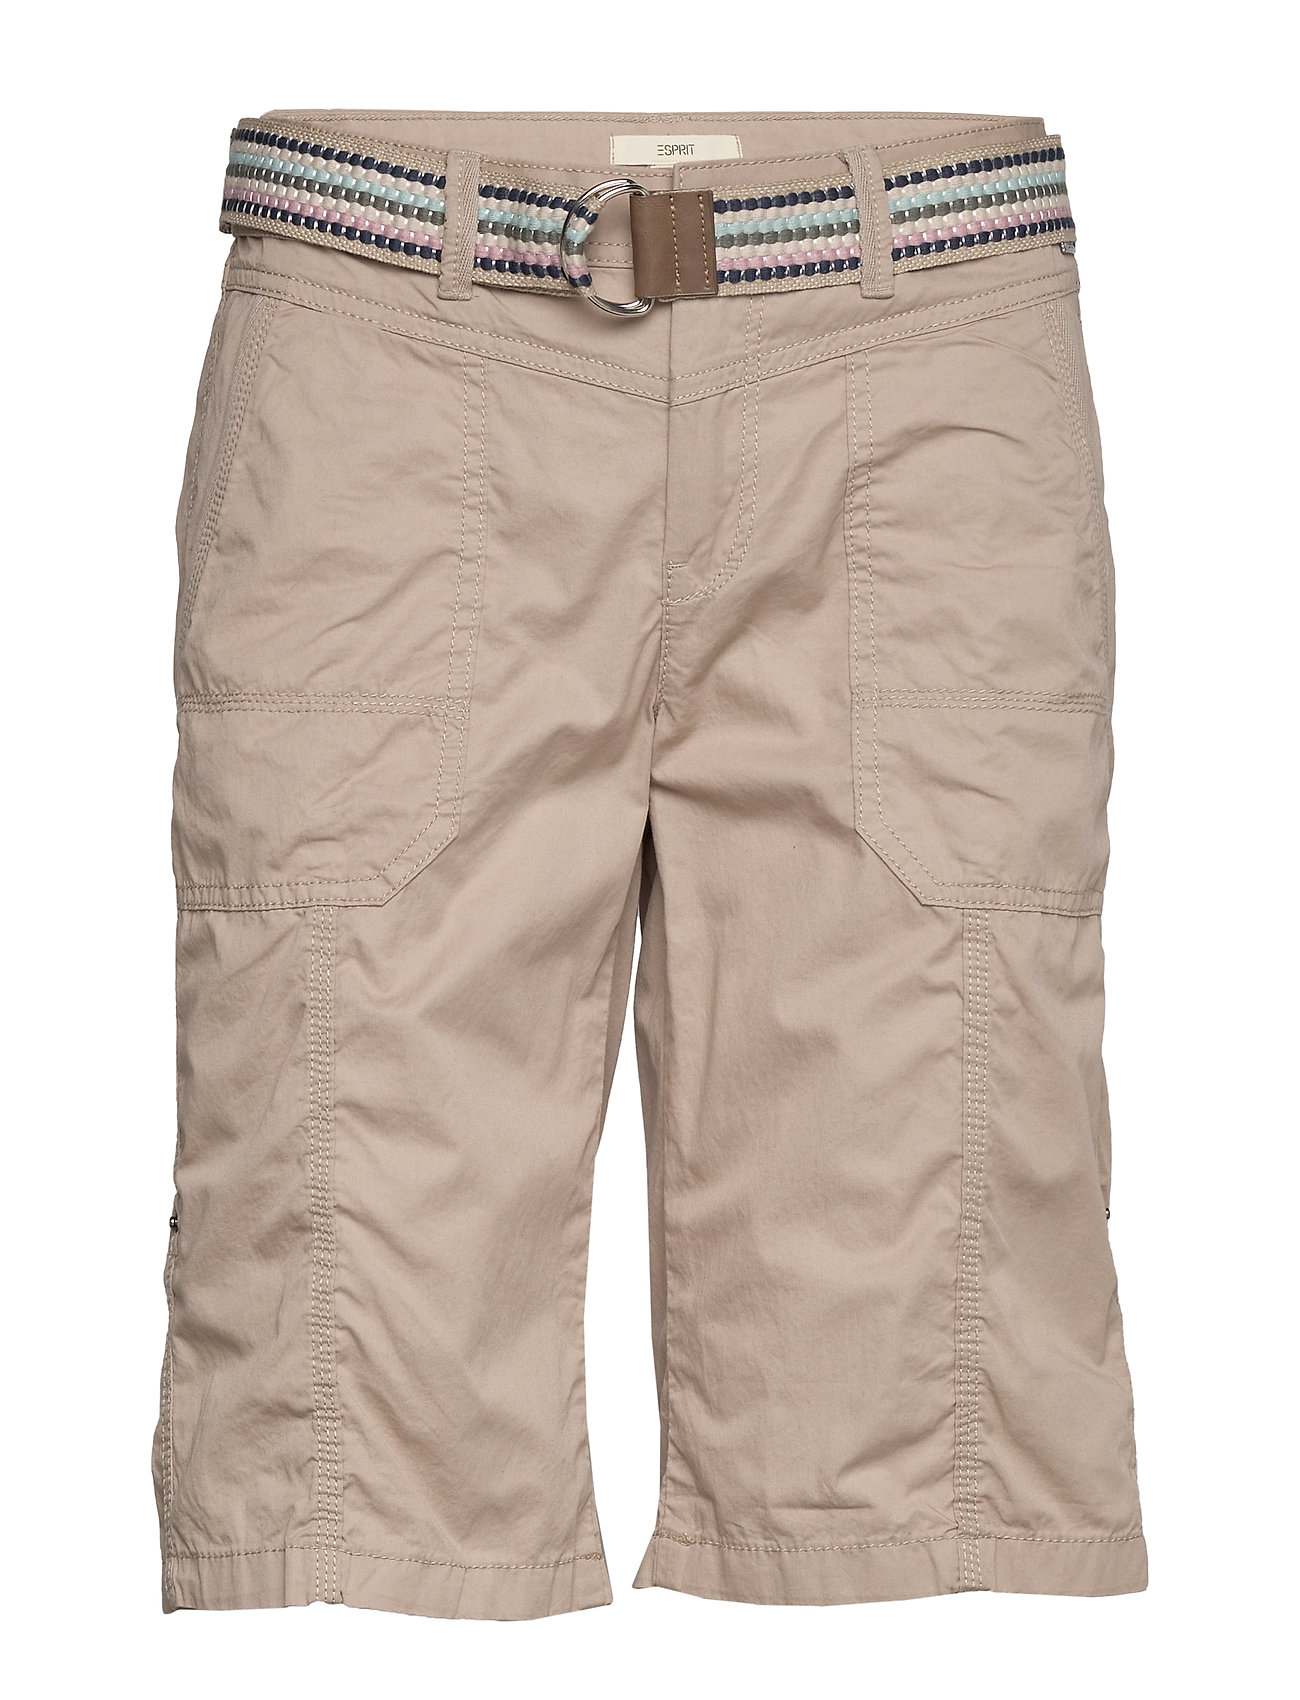 Esprit Casual Shorts woven - BEIGE